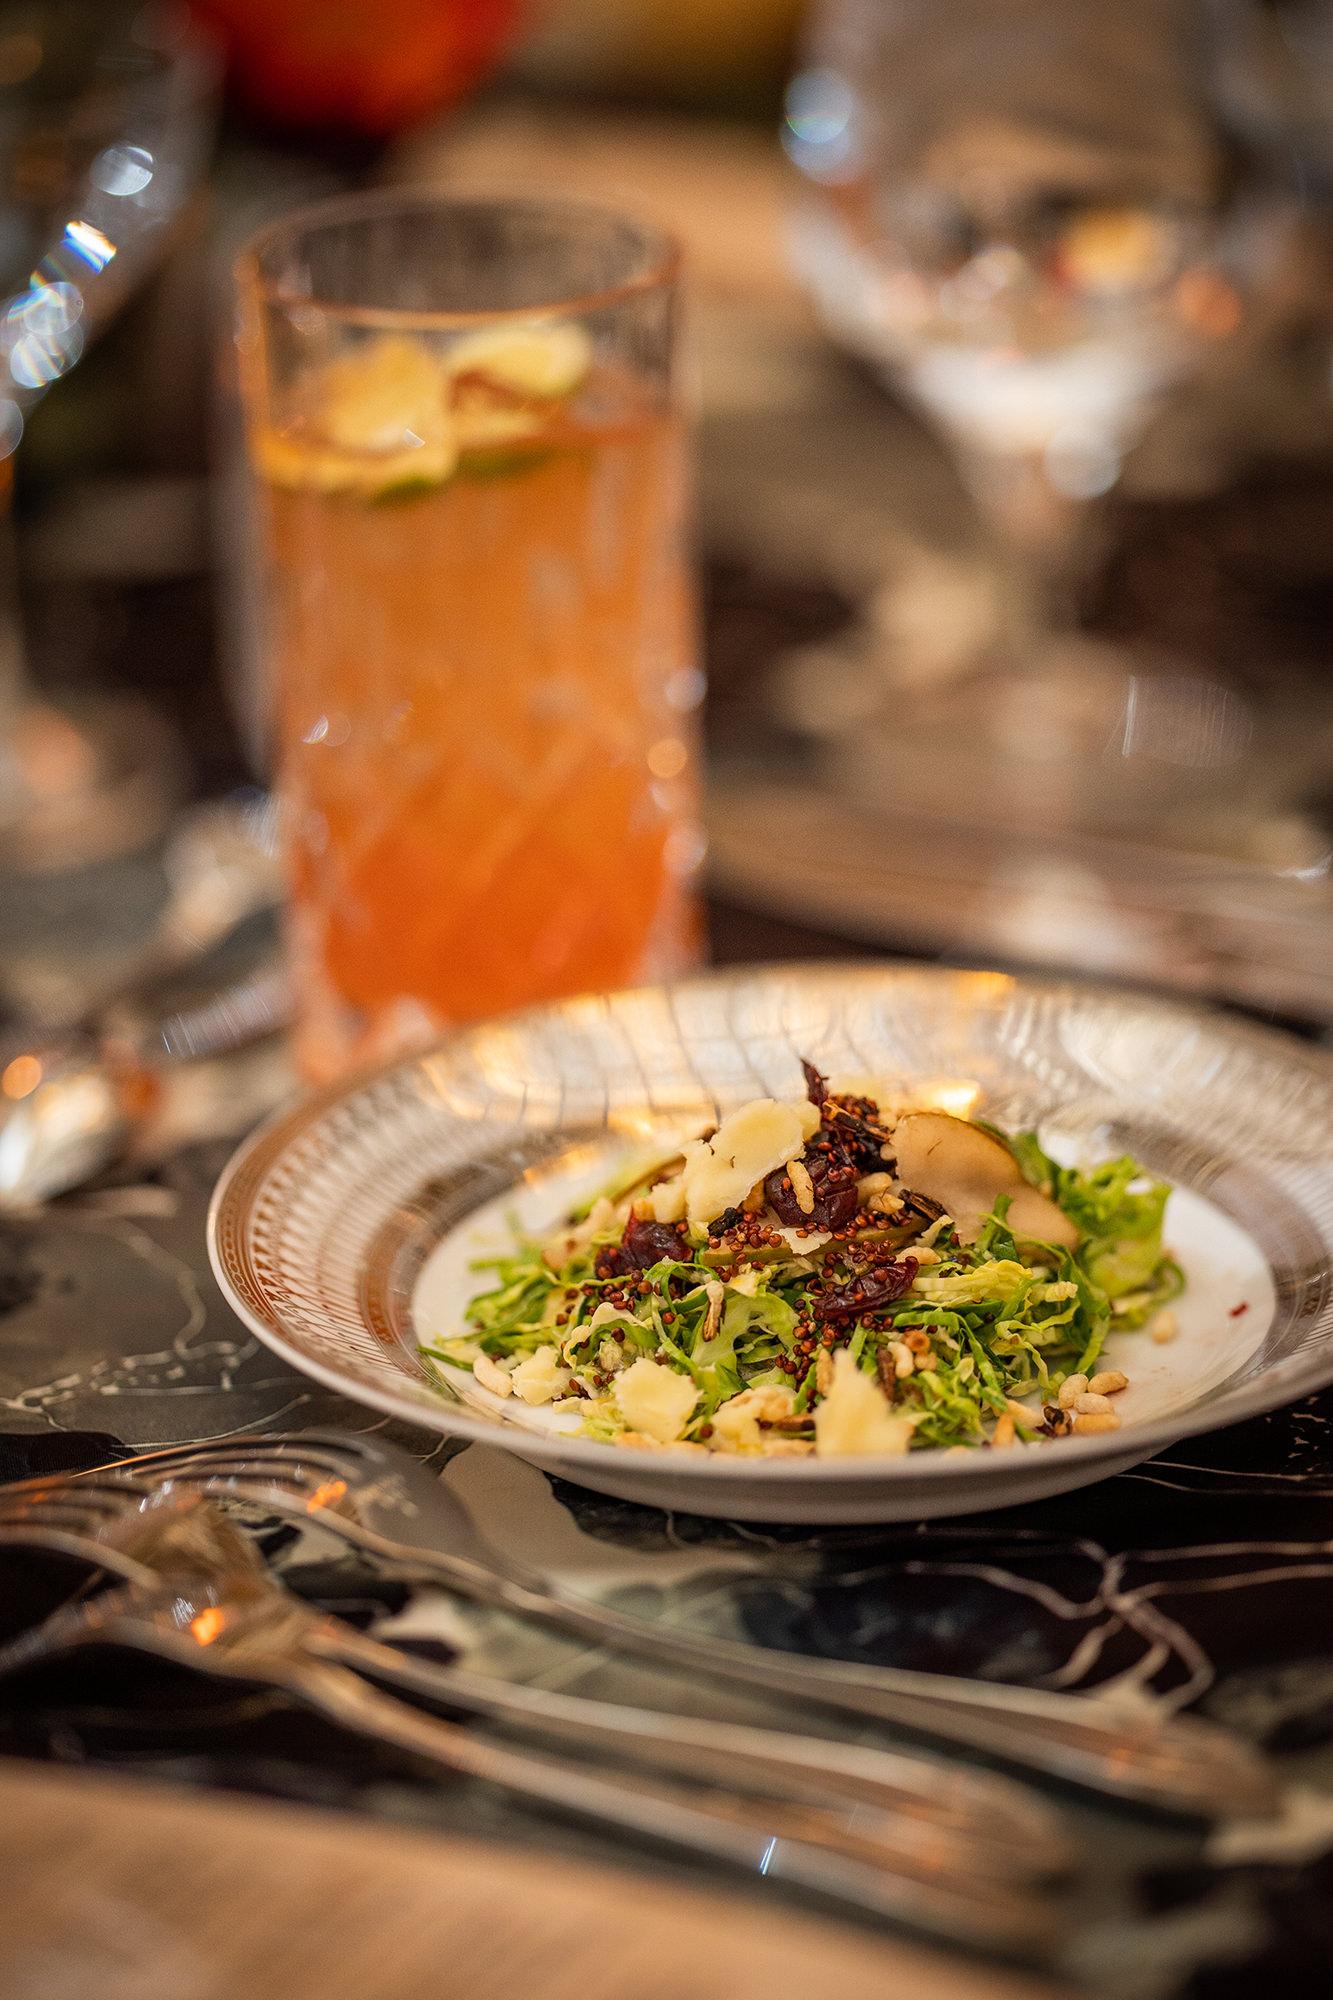 Chef Dinner - Salad